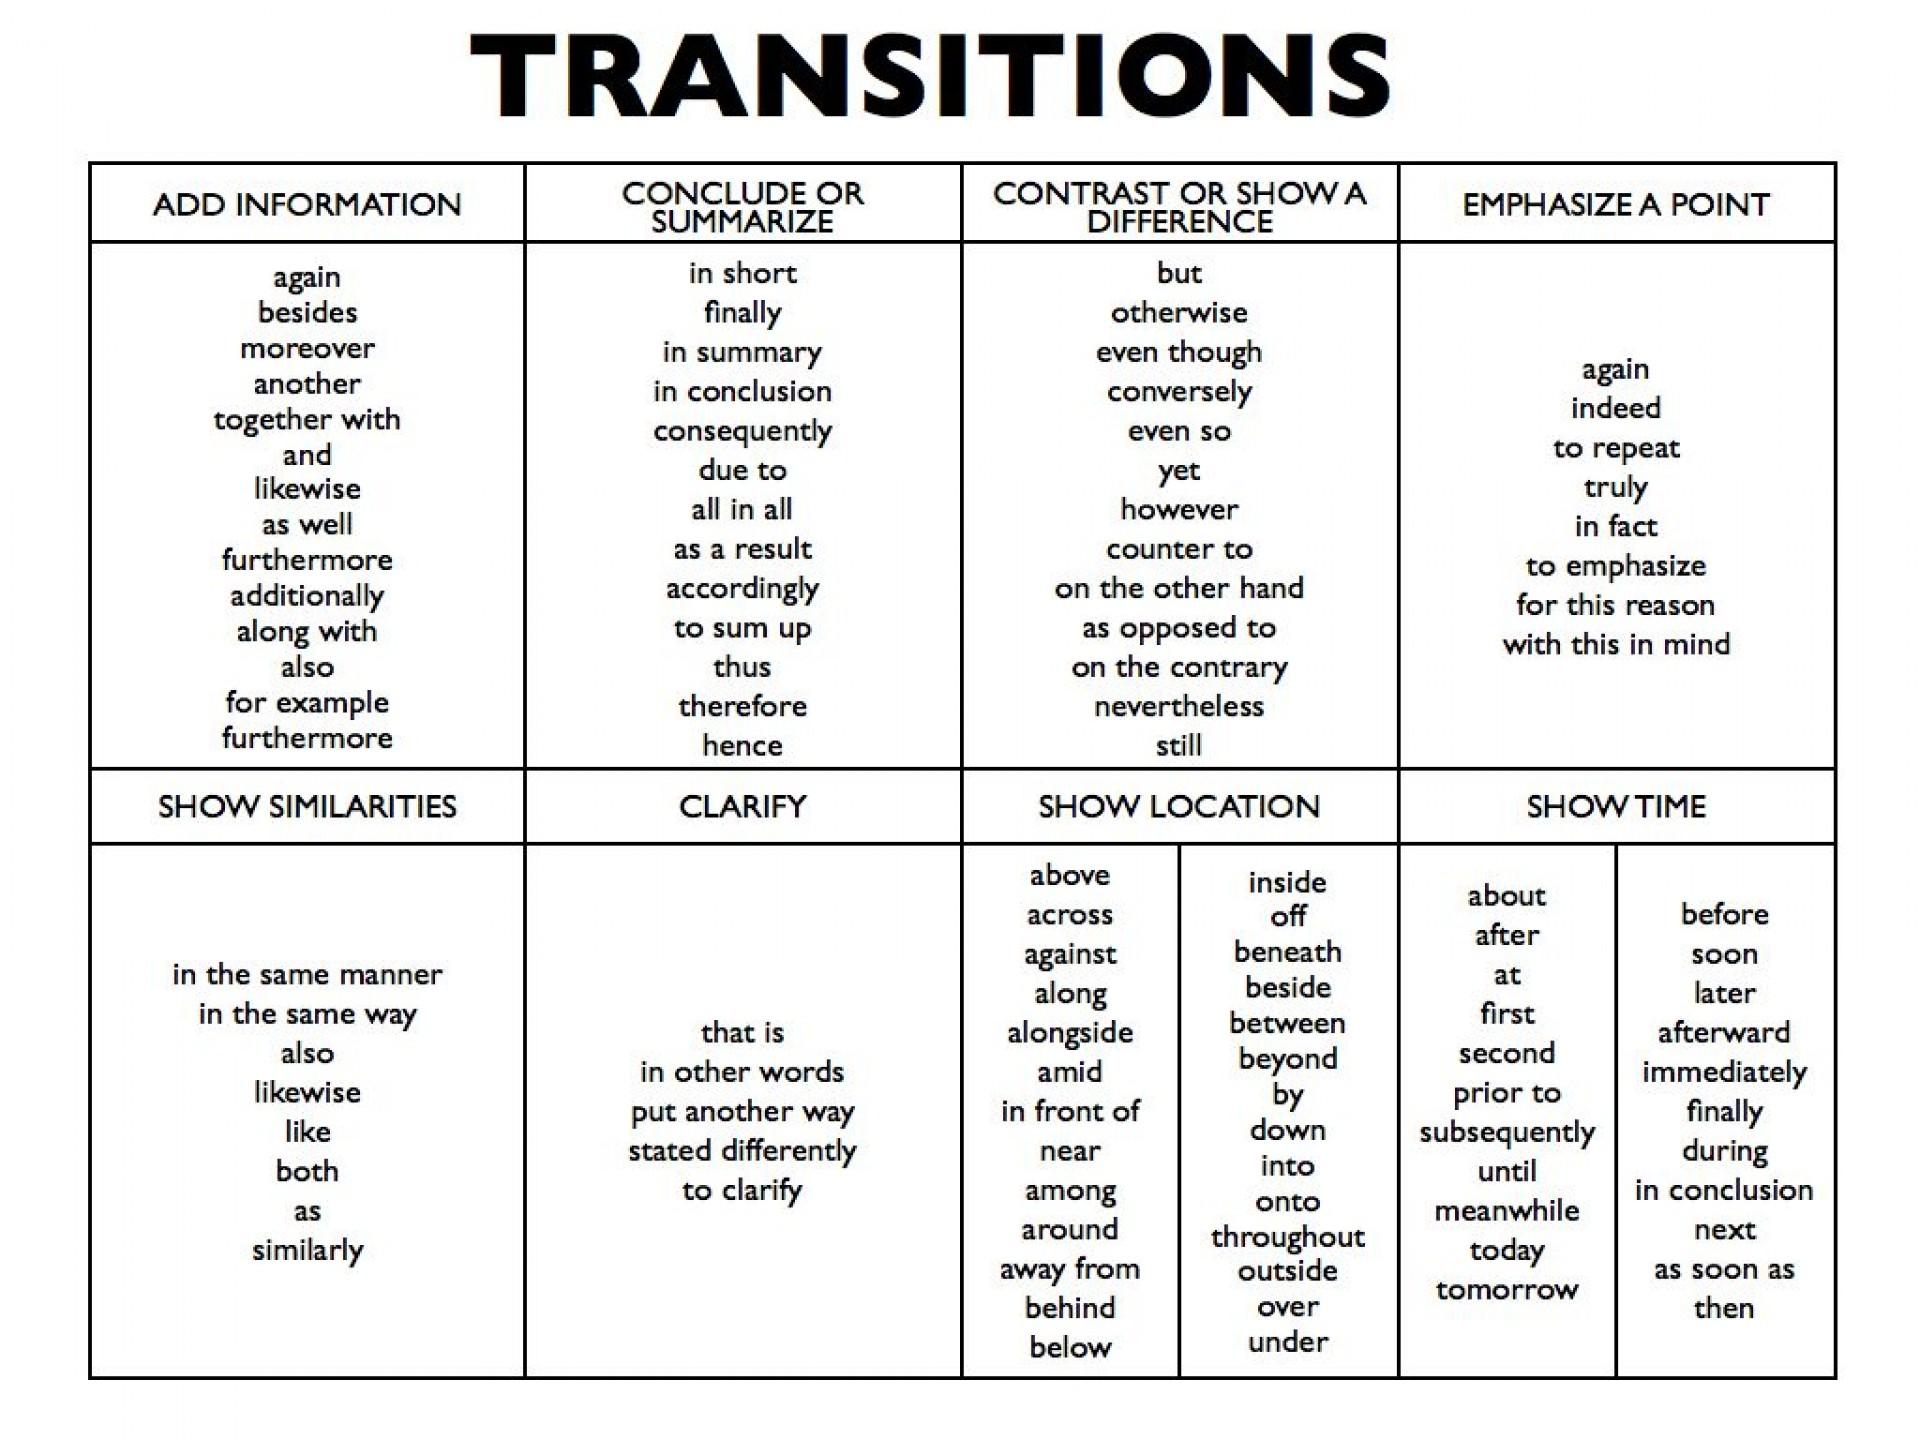 008 Essay Example Transitions For Essays Good L Stupendous Conclusion Paper 1920